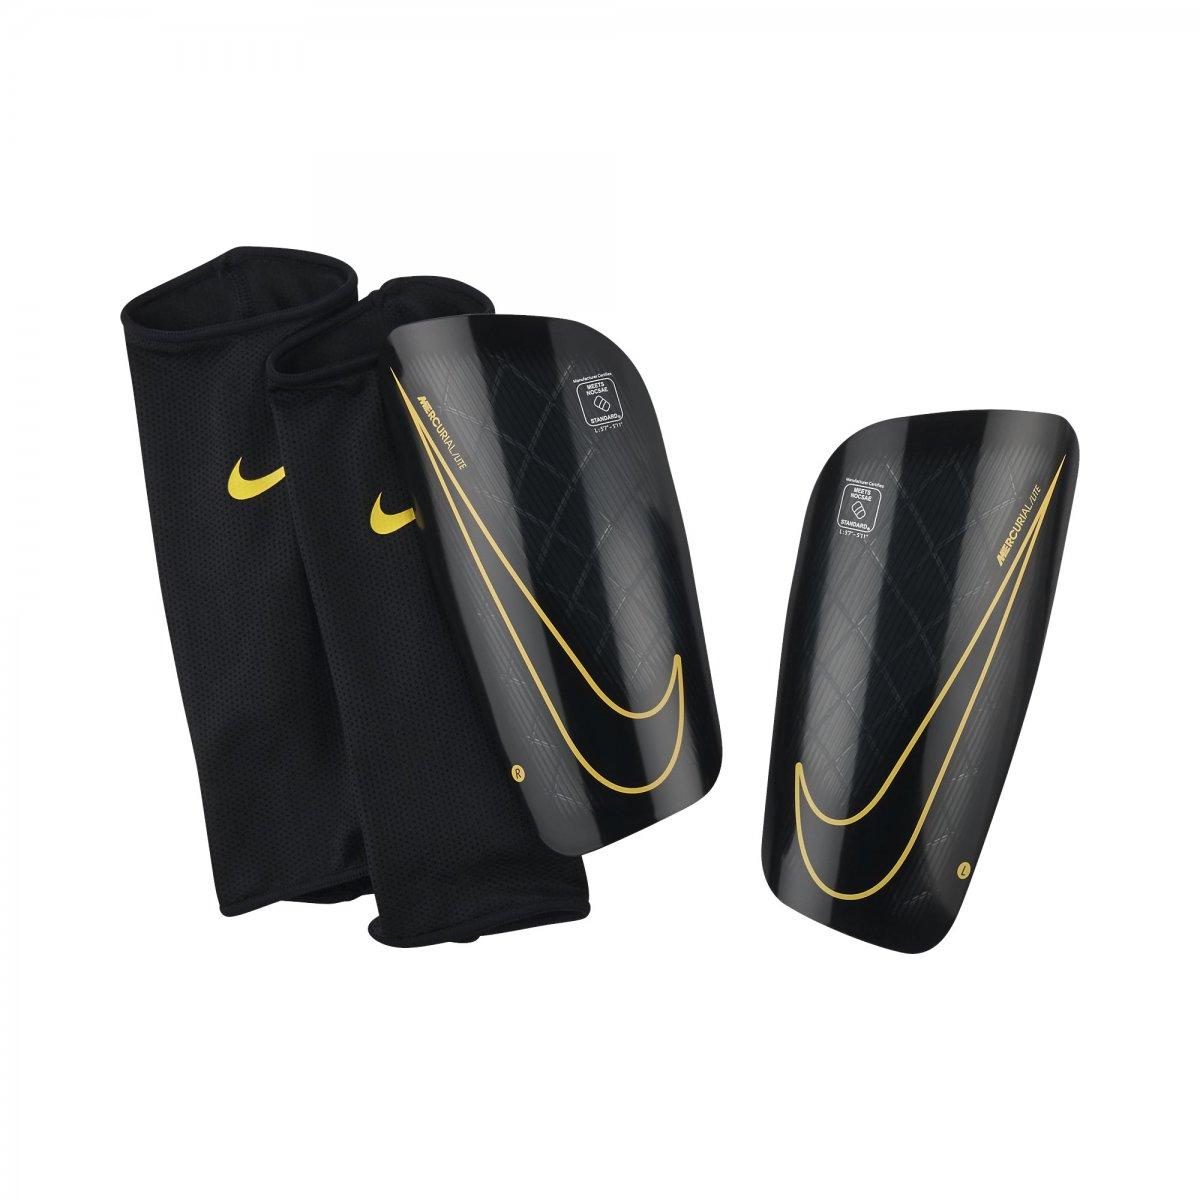 Caneleira Nike Mercurial Lite SP2086-013 Preto Laranja 4ea1e91893b82